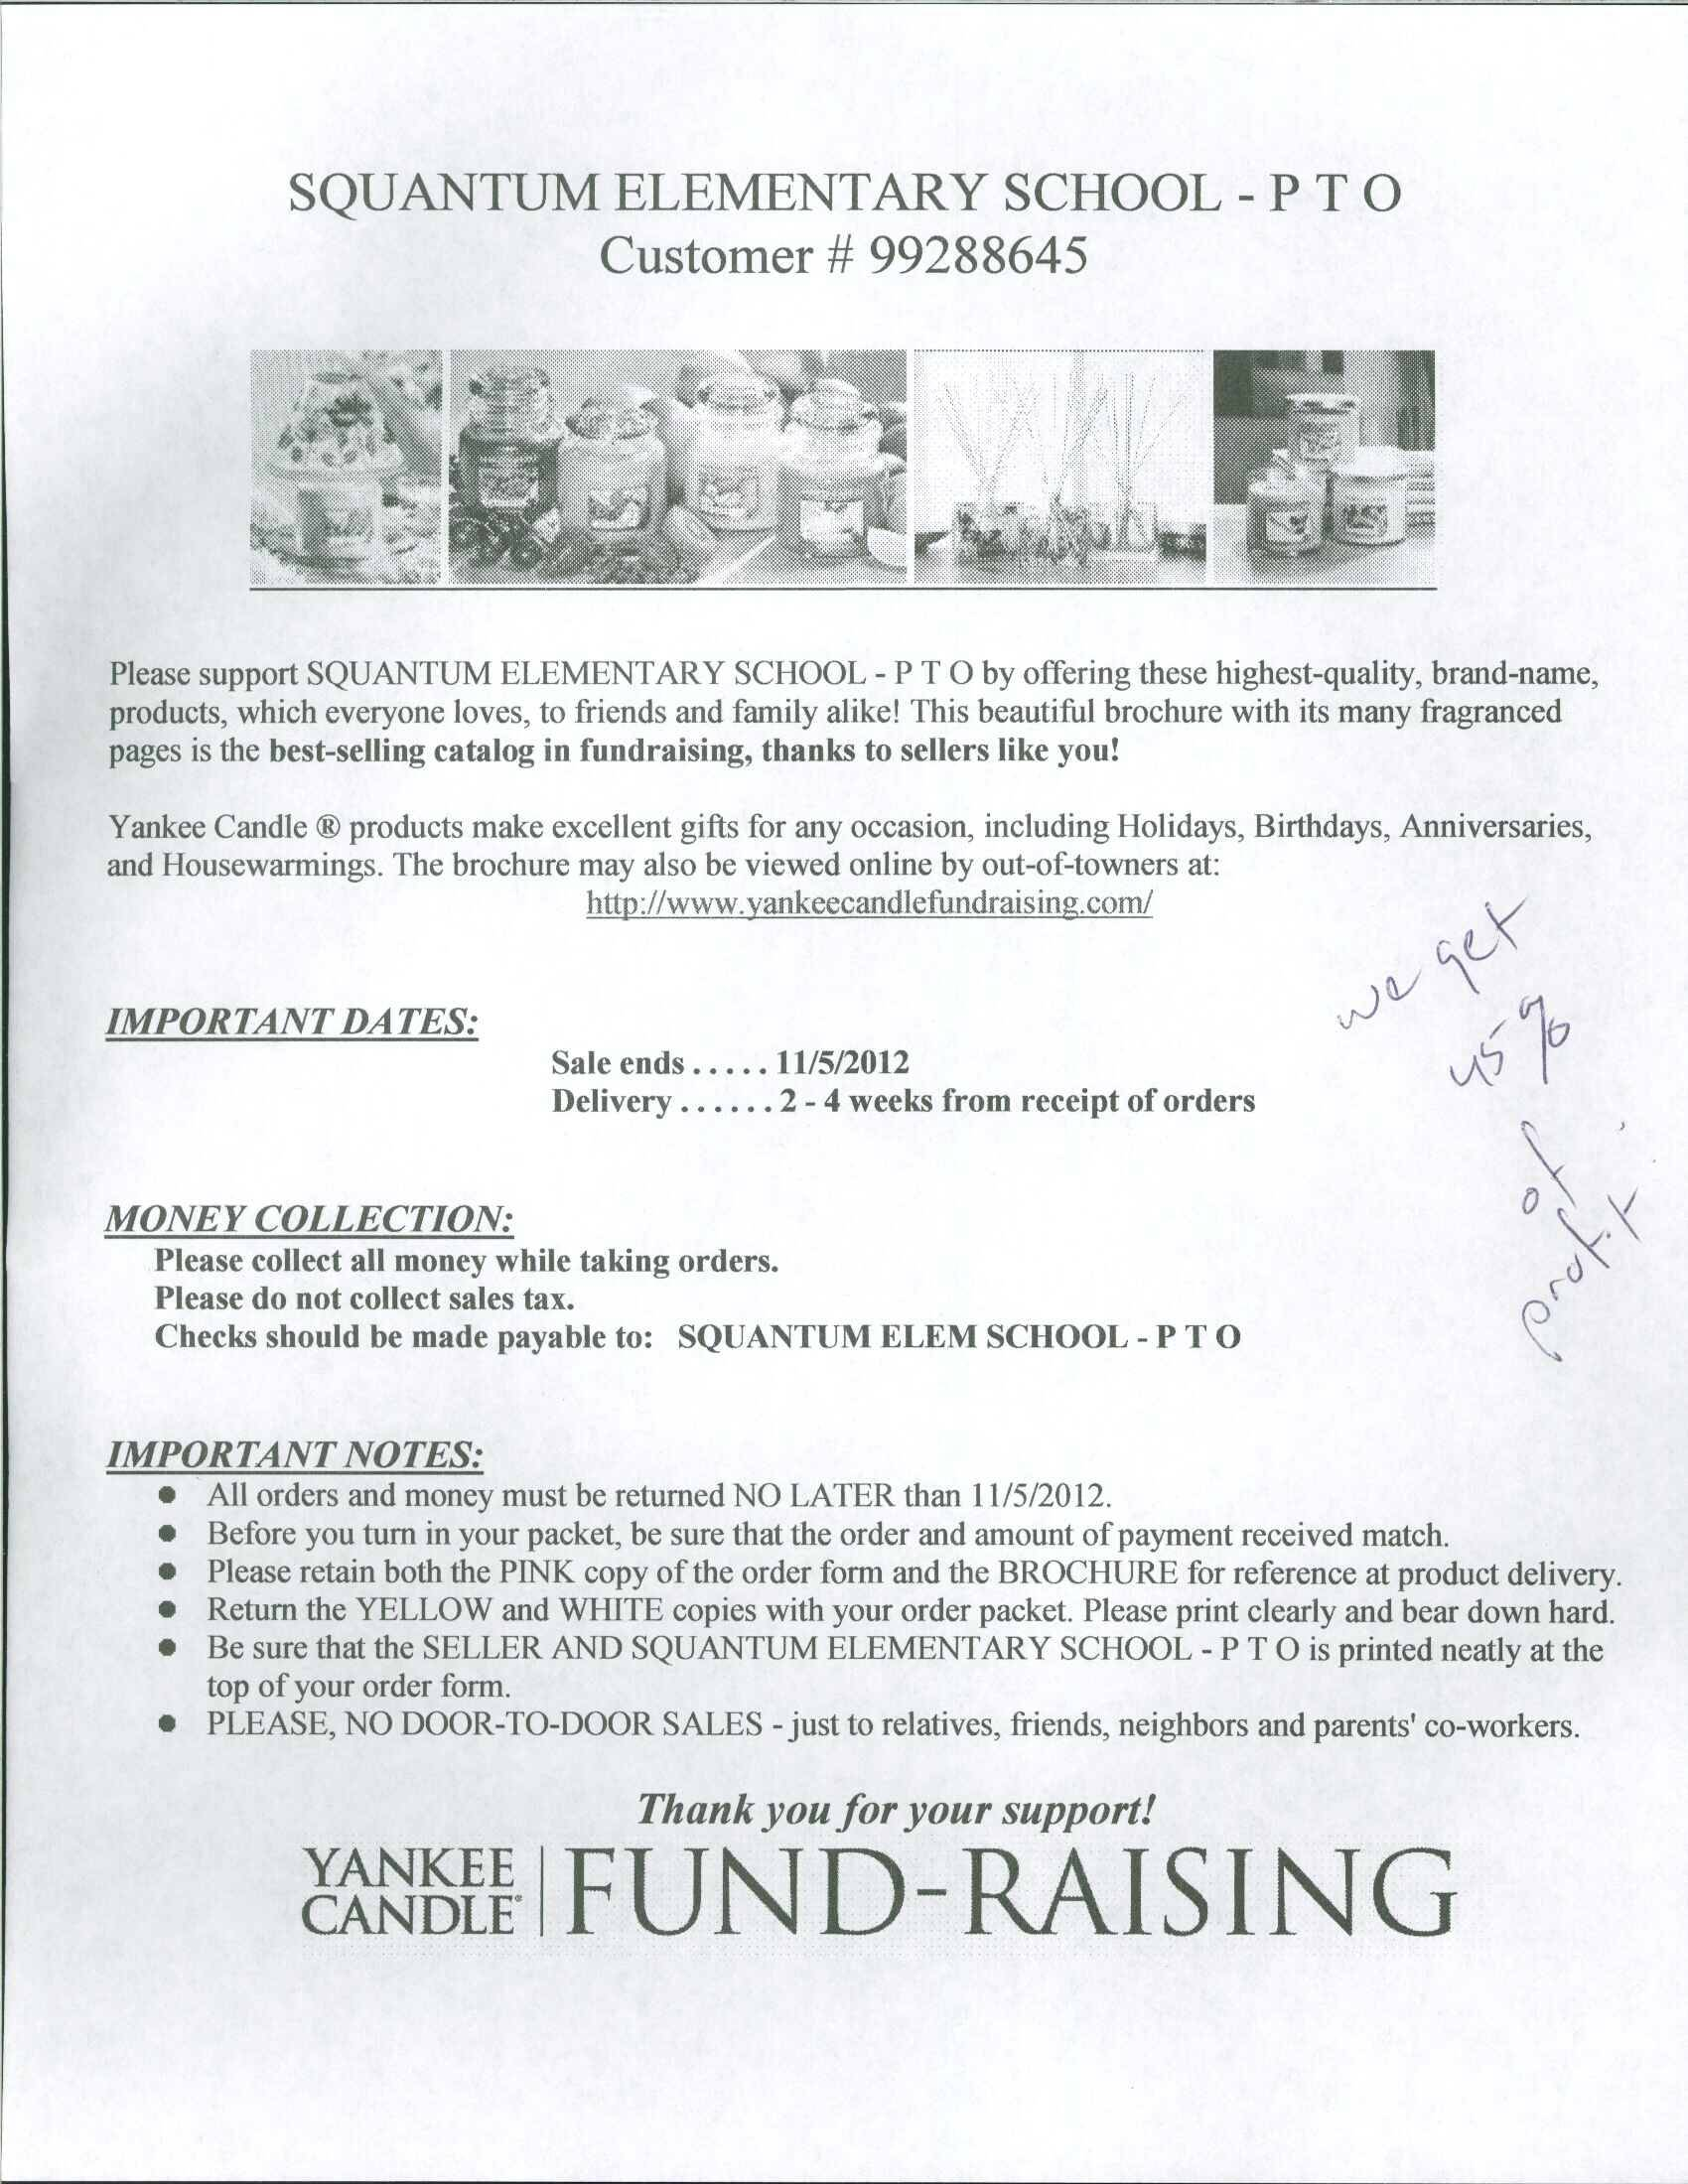 Yankee Candle Fundraiser | Squantum School PTO